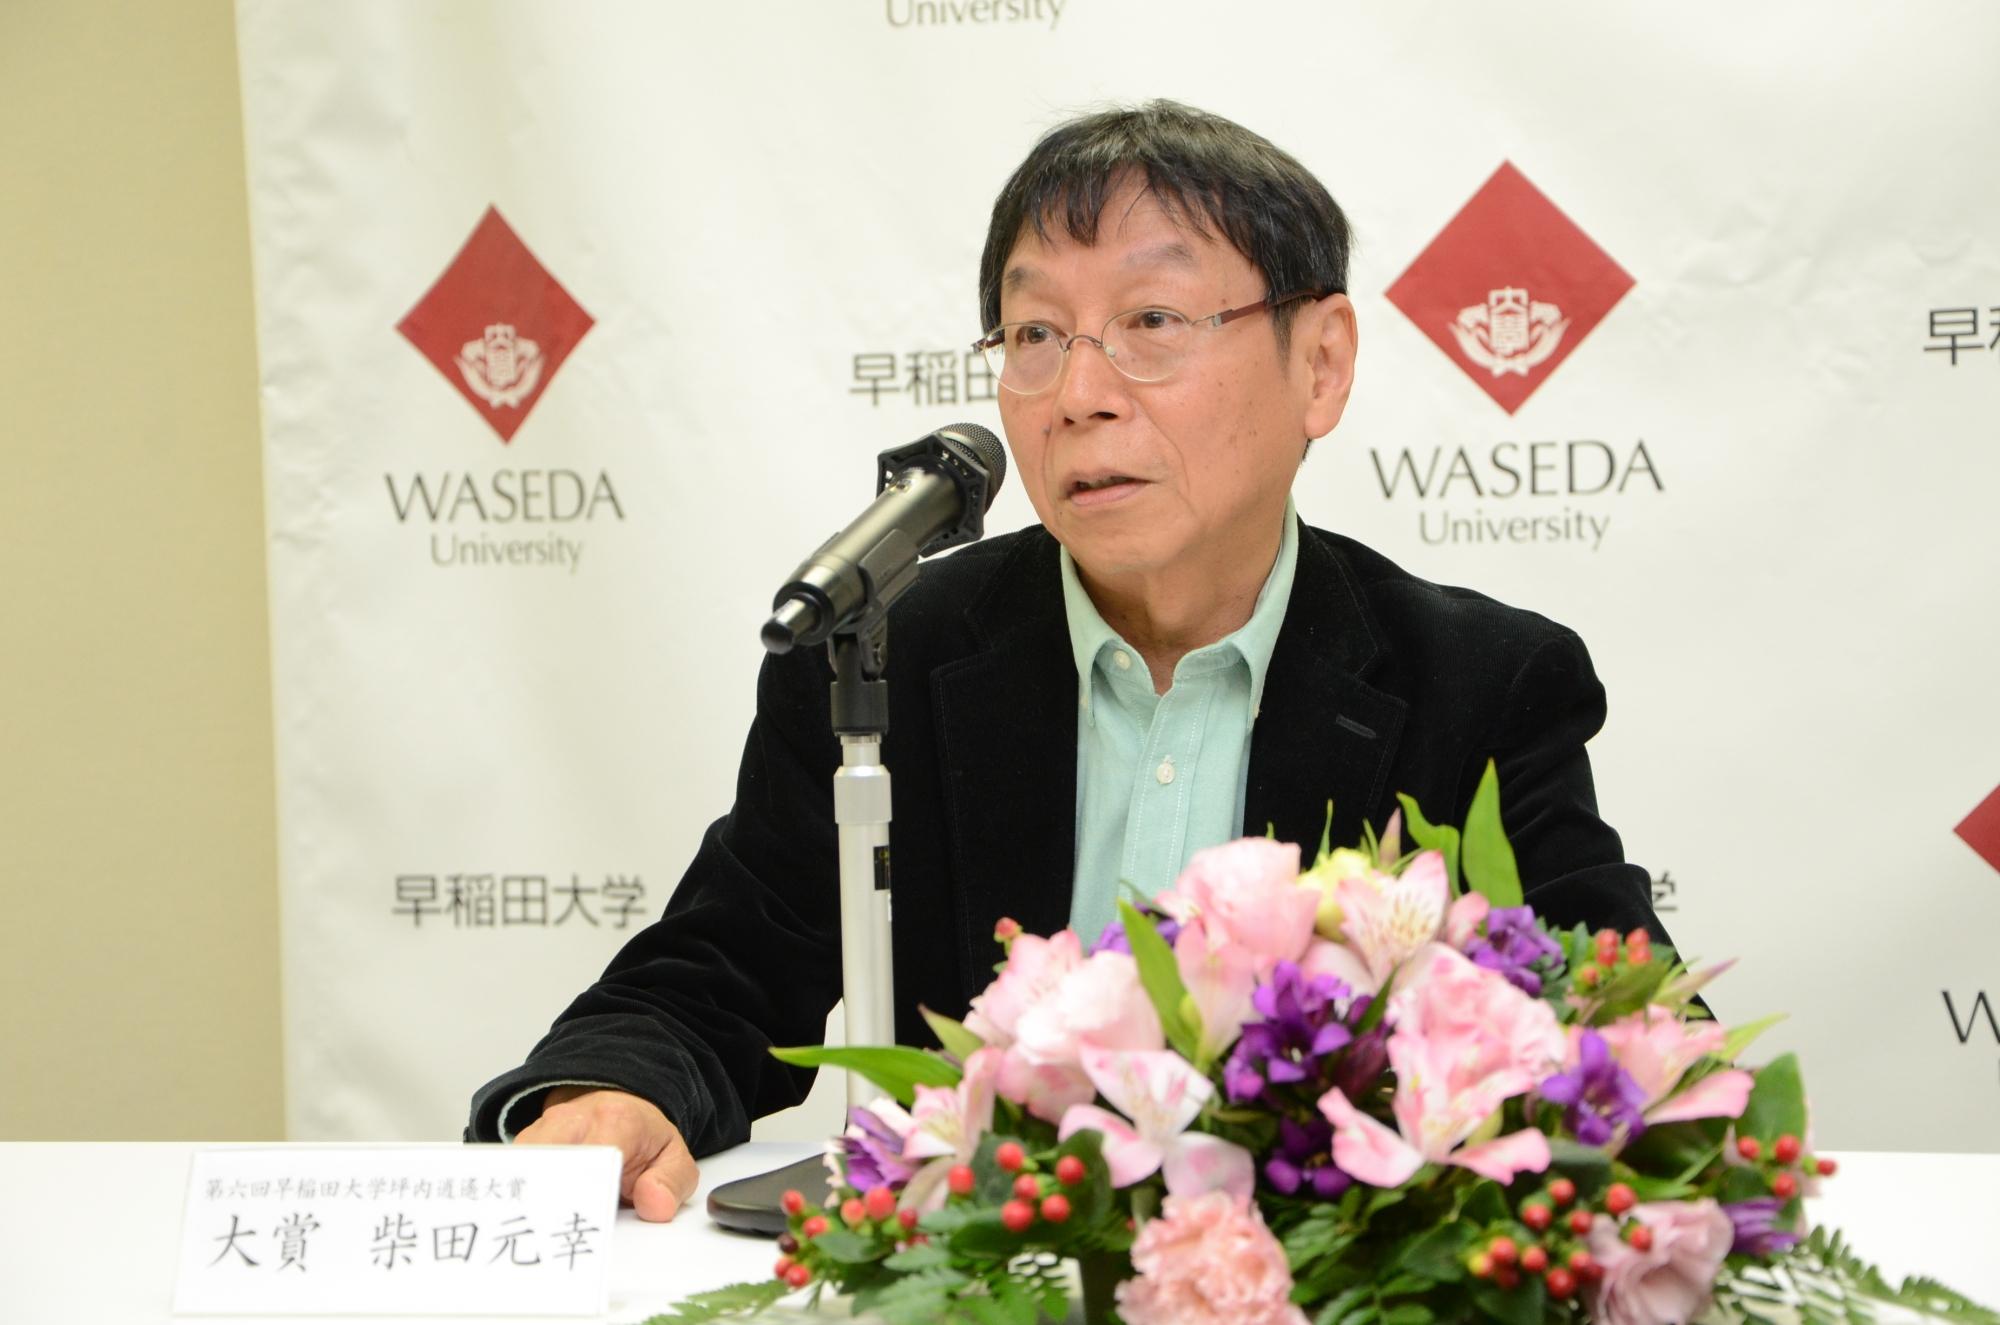 Motoyuki Shibata named winner of the 2017 Tsubouchi Shoyo Award